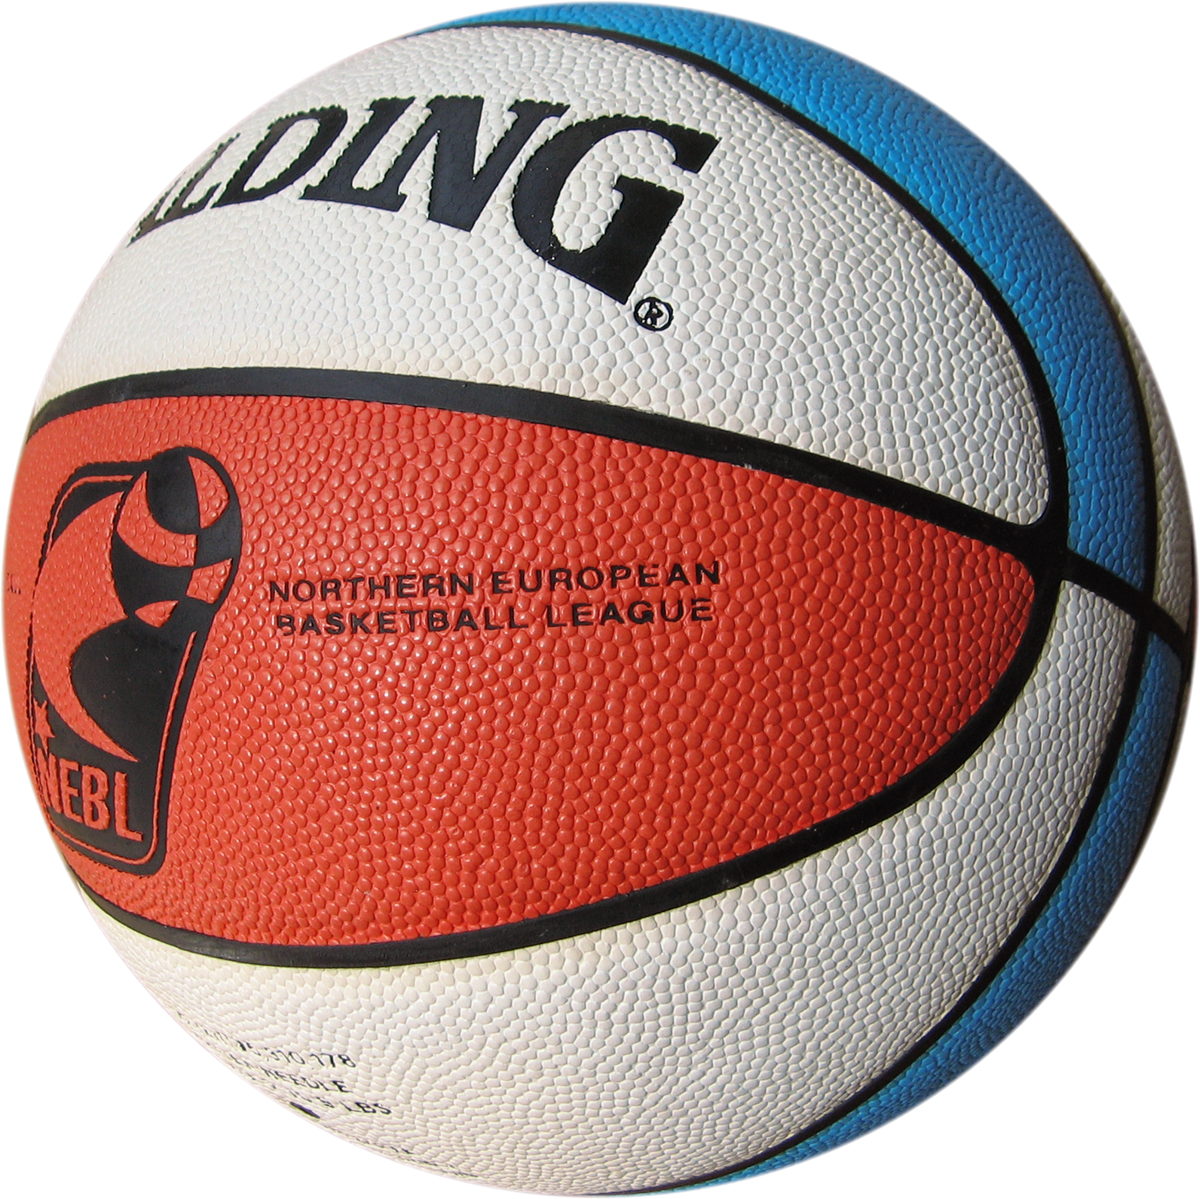 North European Basketball League Wikipedia